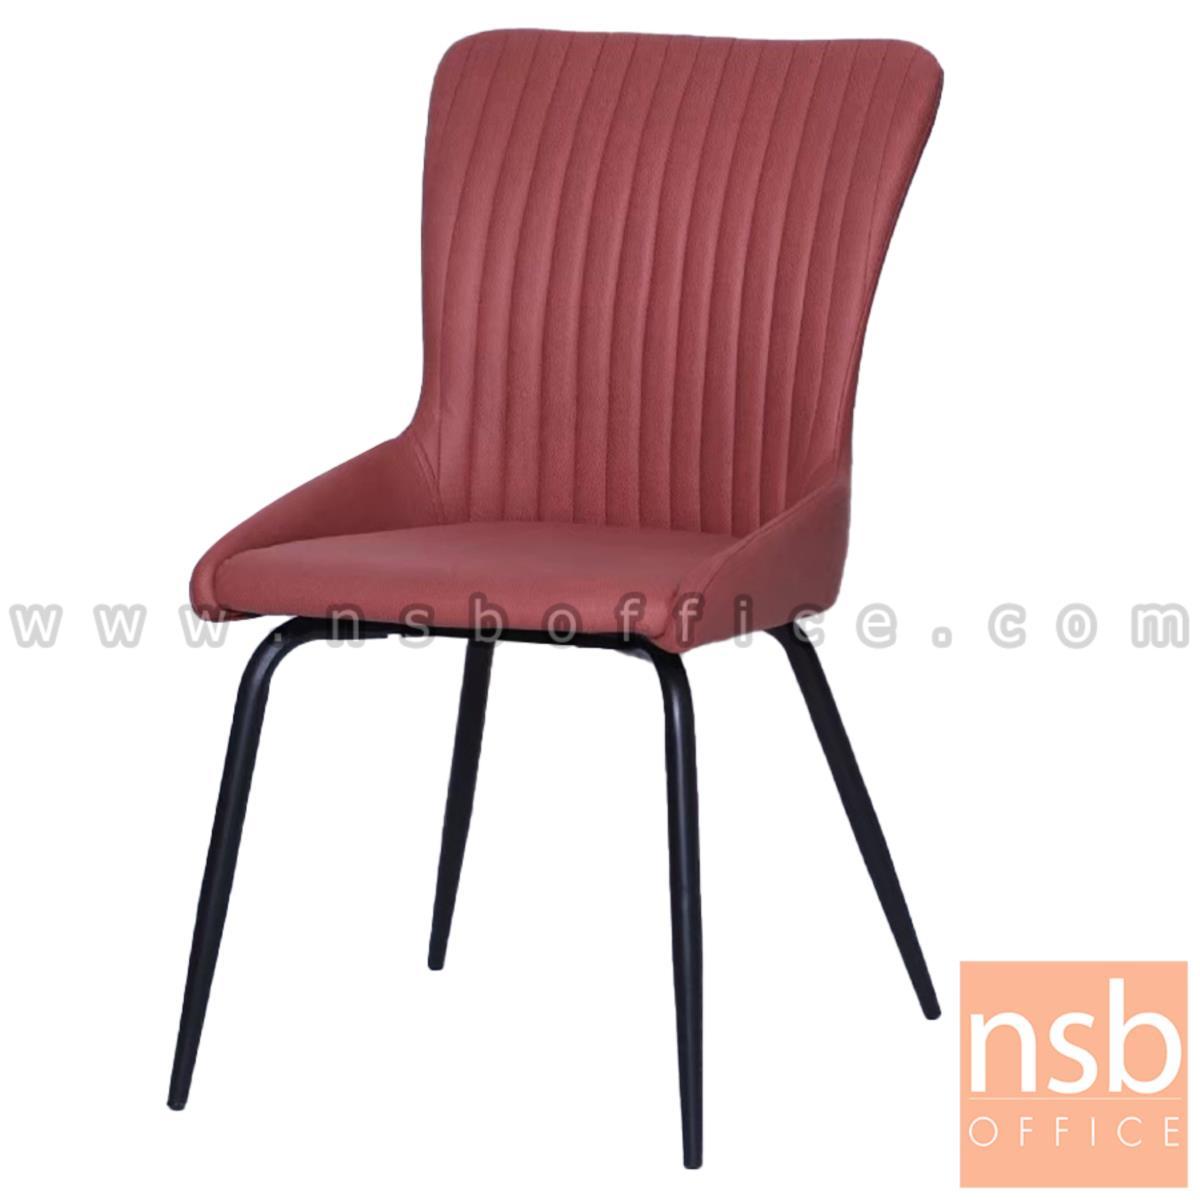 B29A366:เก้าอี้โมเดิร์นหุ้มหนัง รุ่น Spacey (สเปซีย์)  ขาเหล็กพ่นดำ